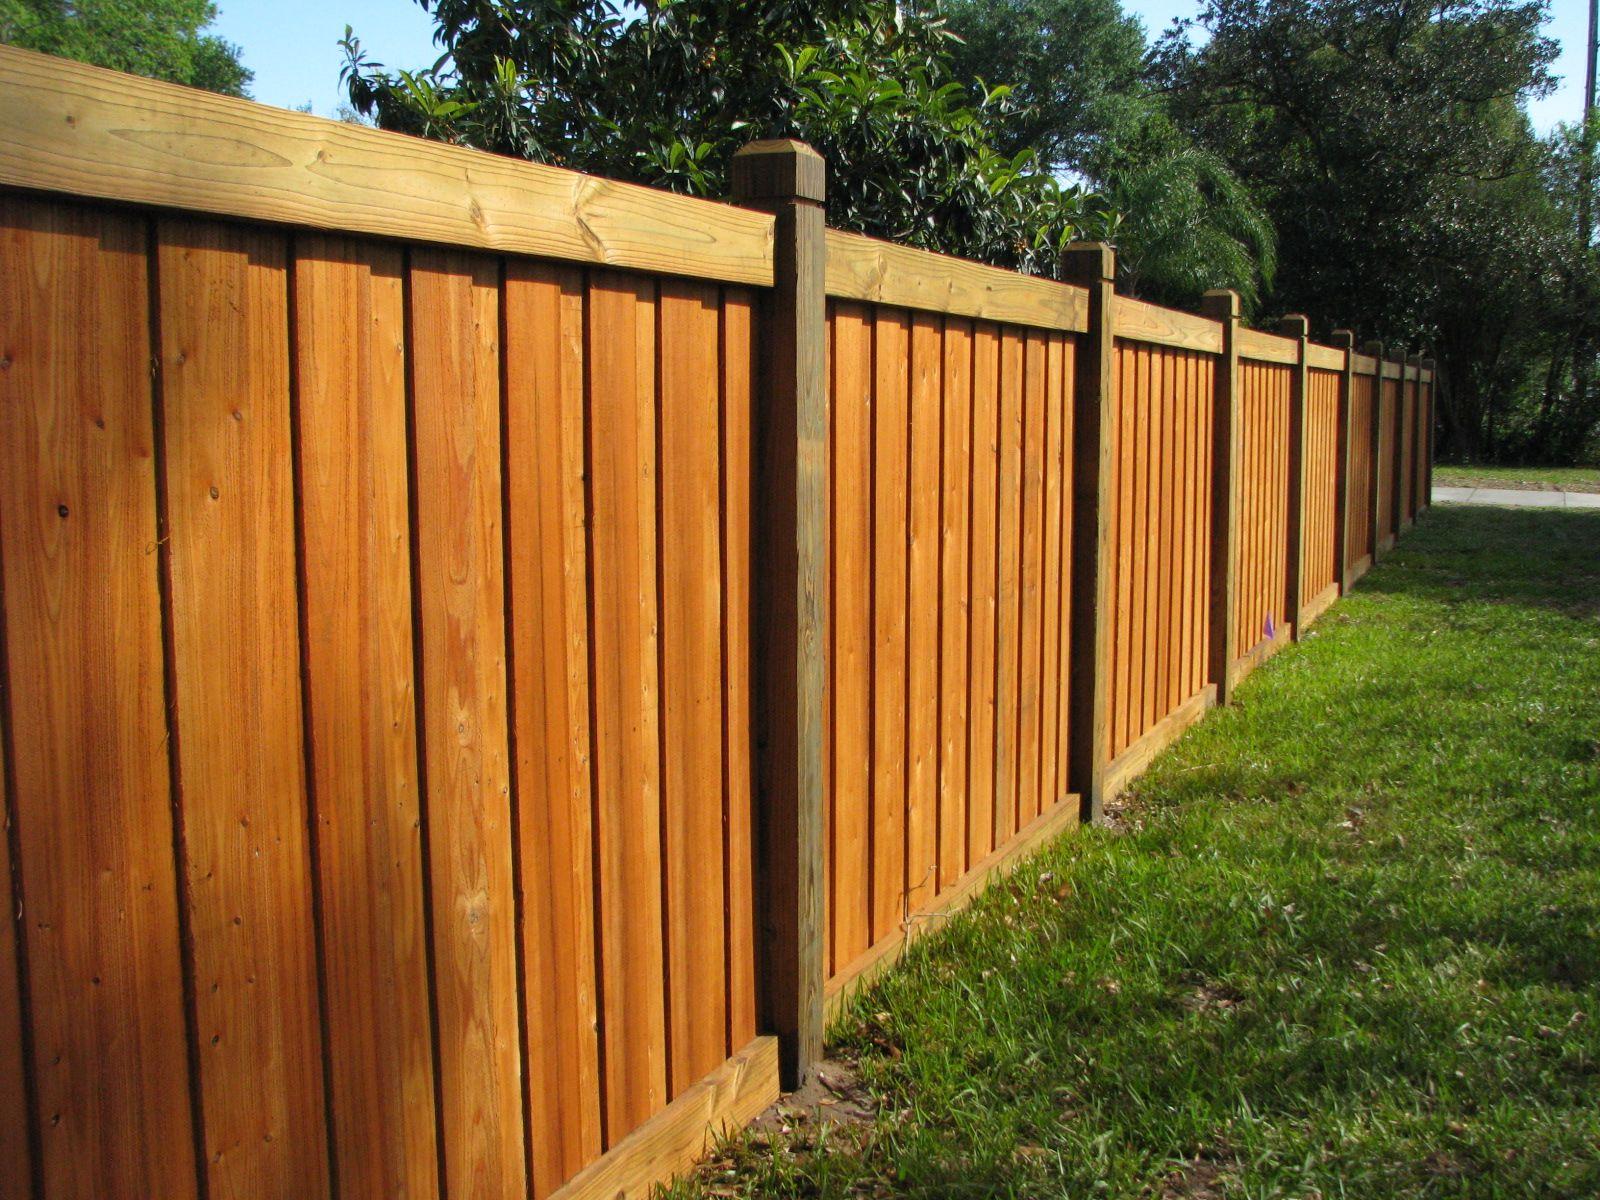 Capped Board On Board Wood Fence Design Mossy Oak Fence Company